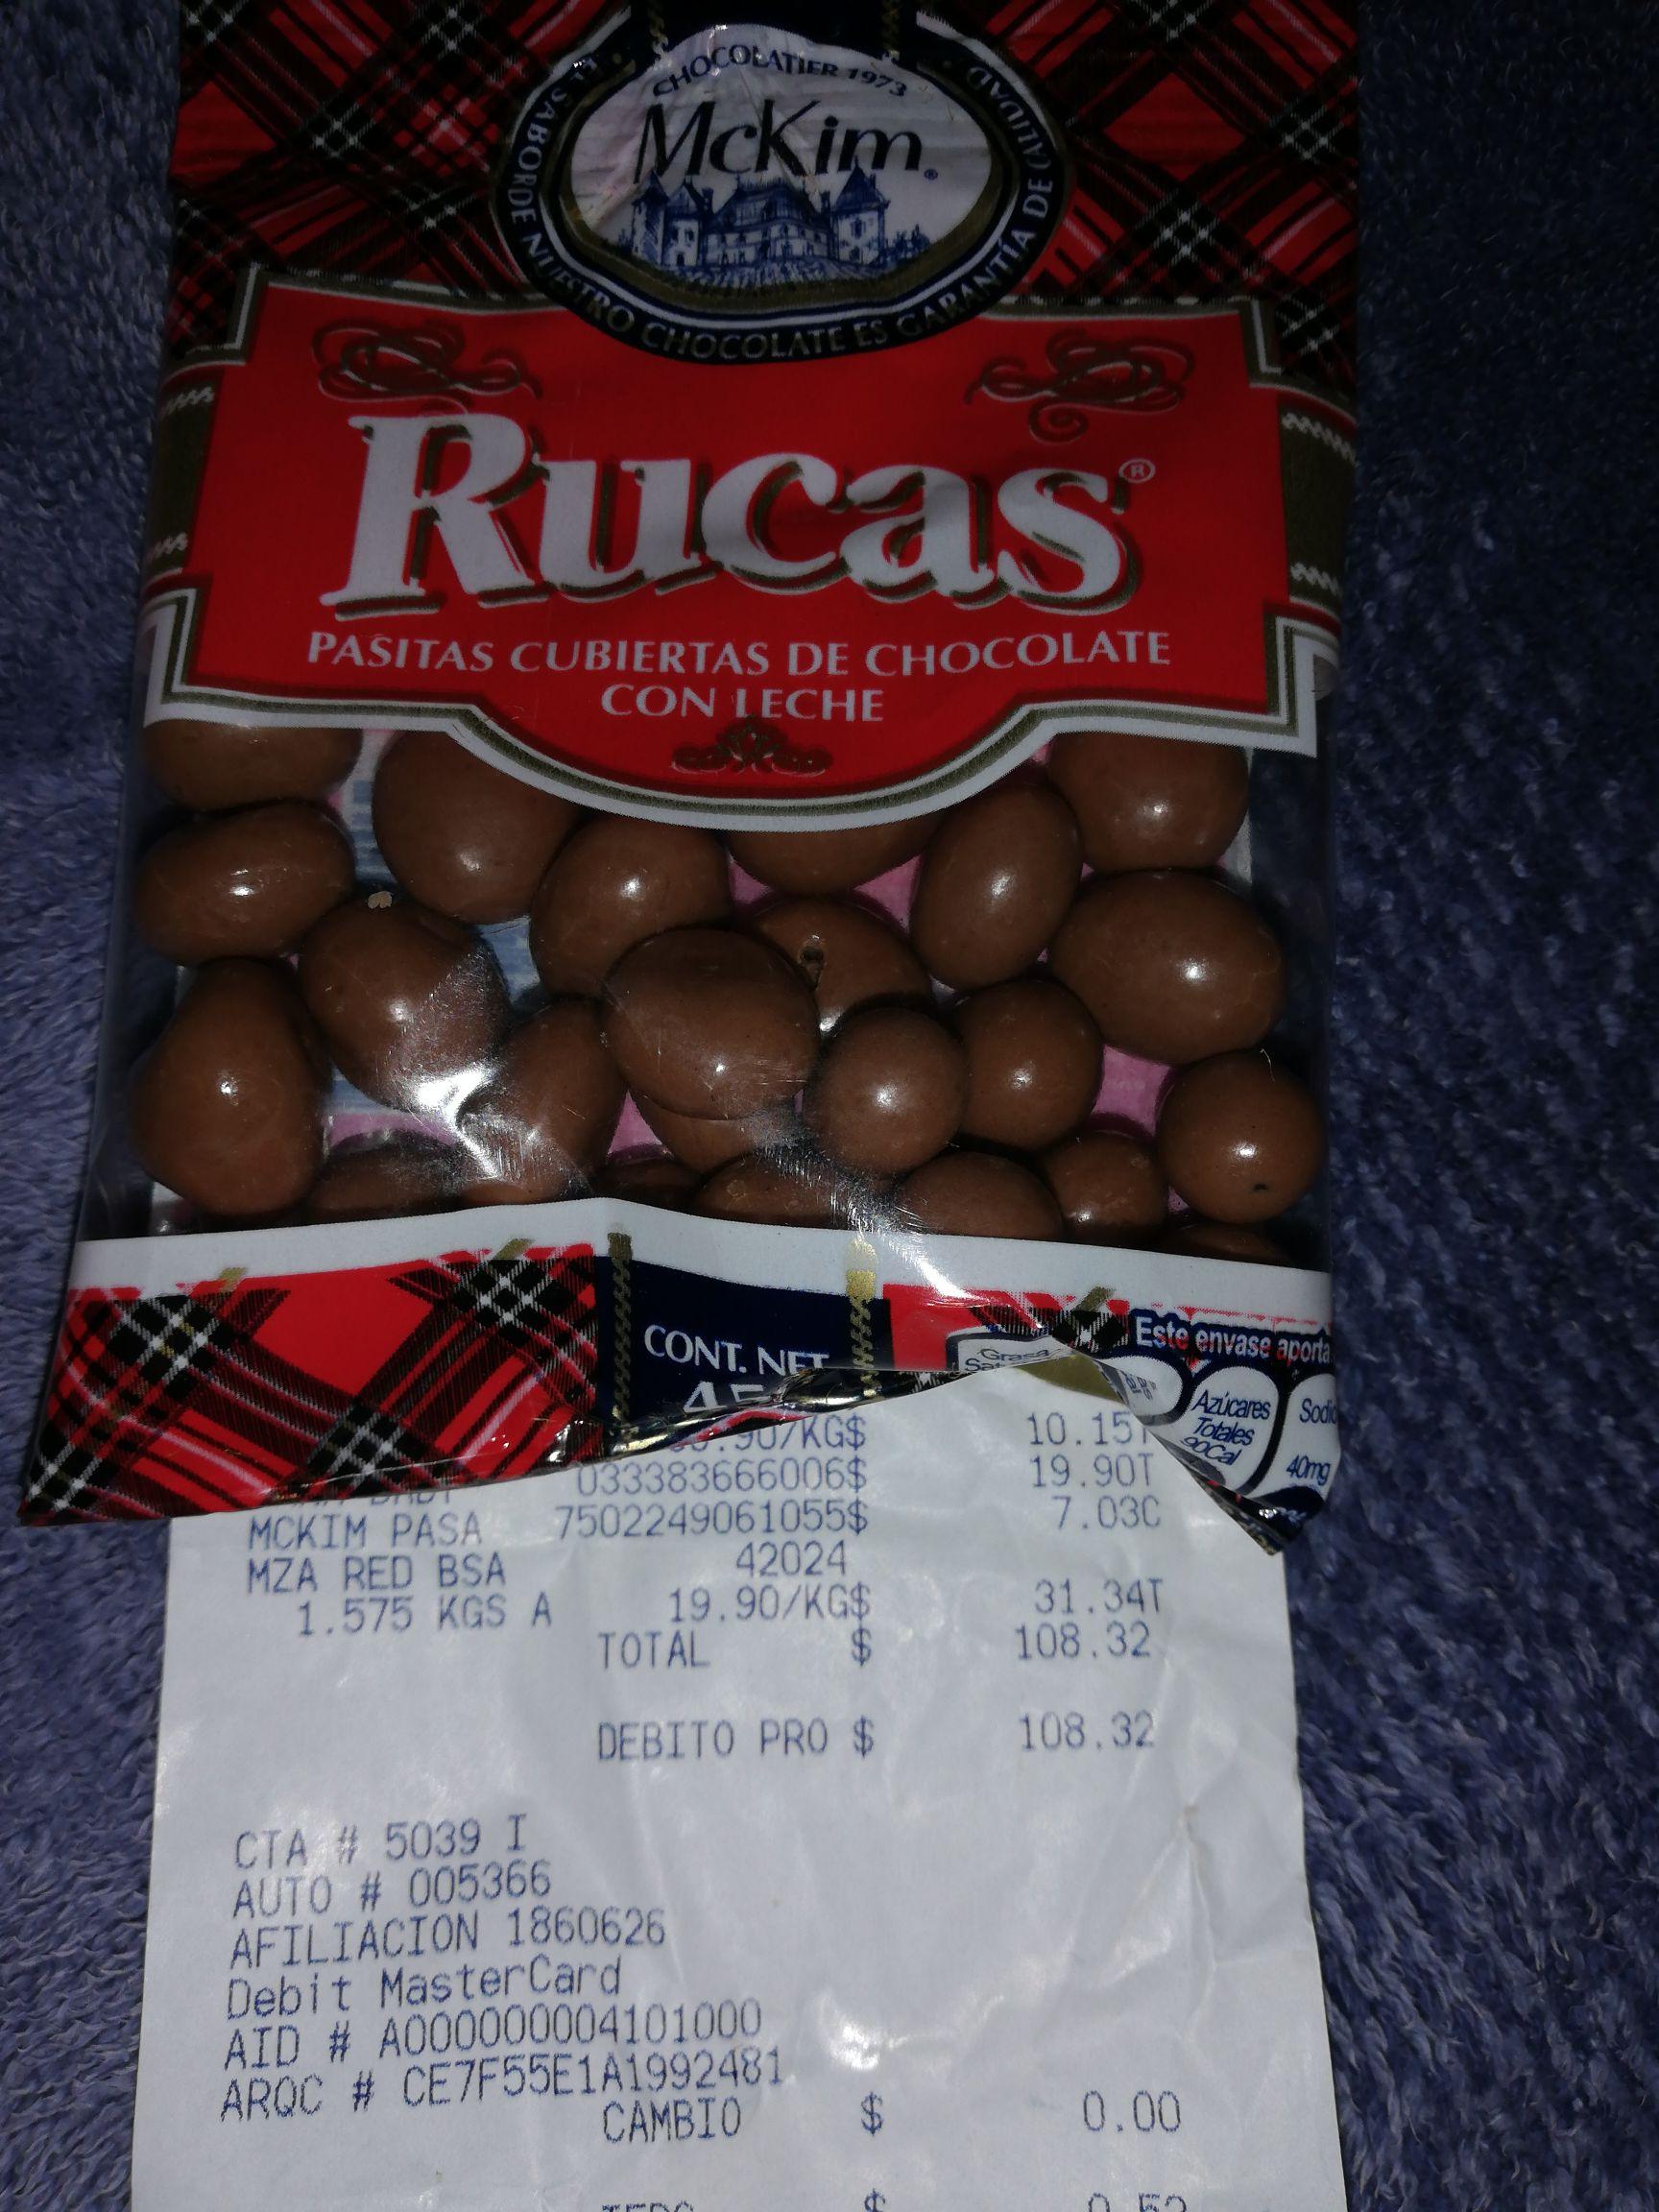 Walmart: Rucas 45g (pasitas cubiertas de chocolate)